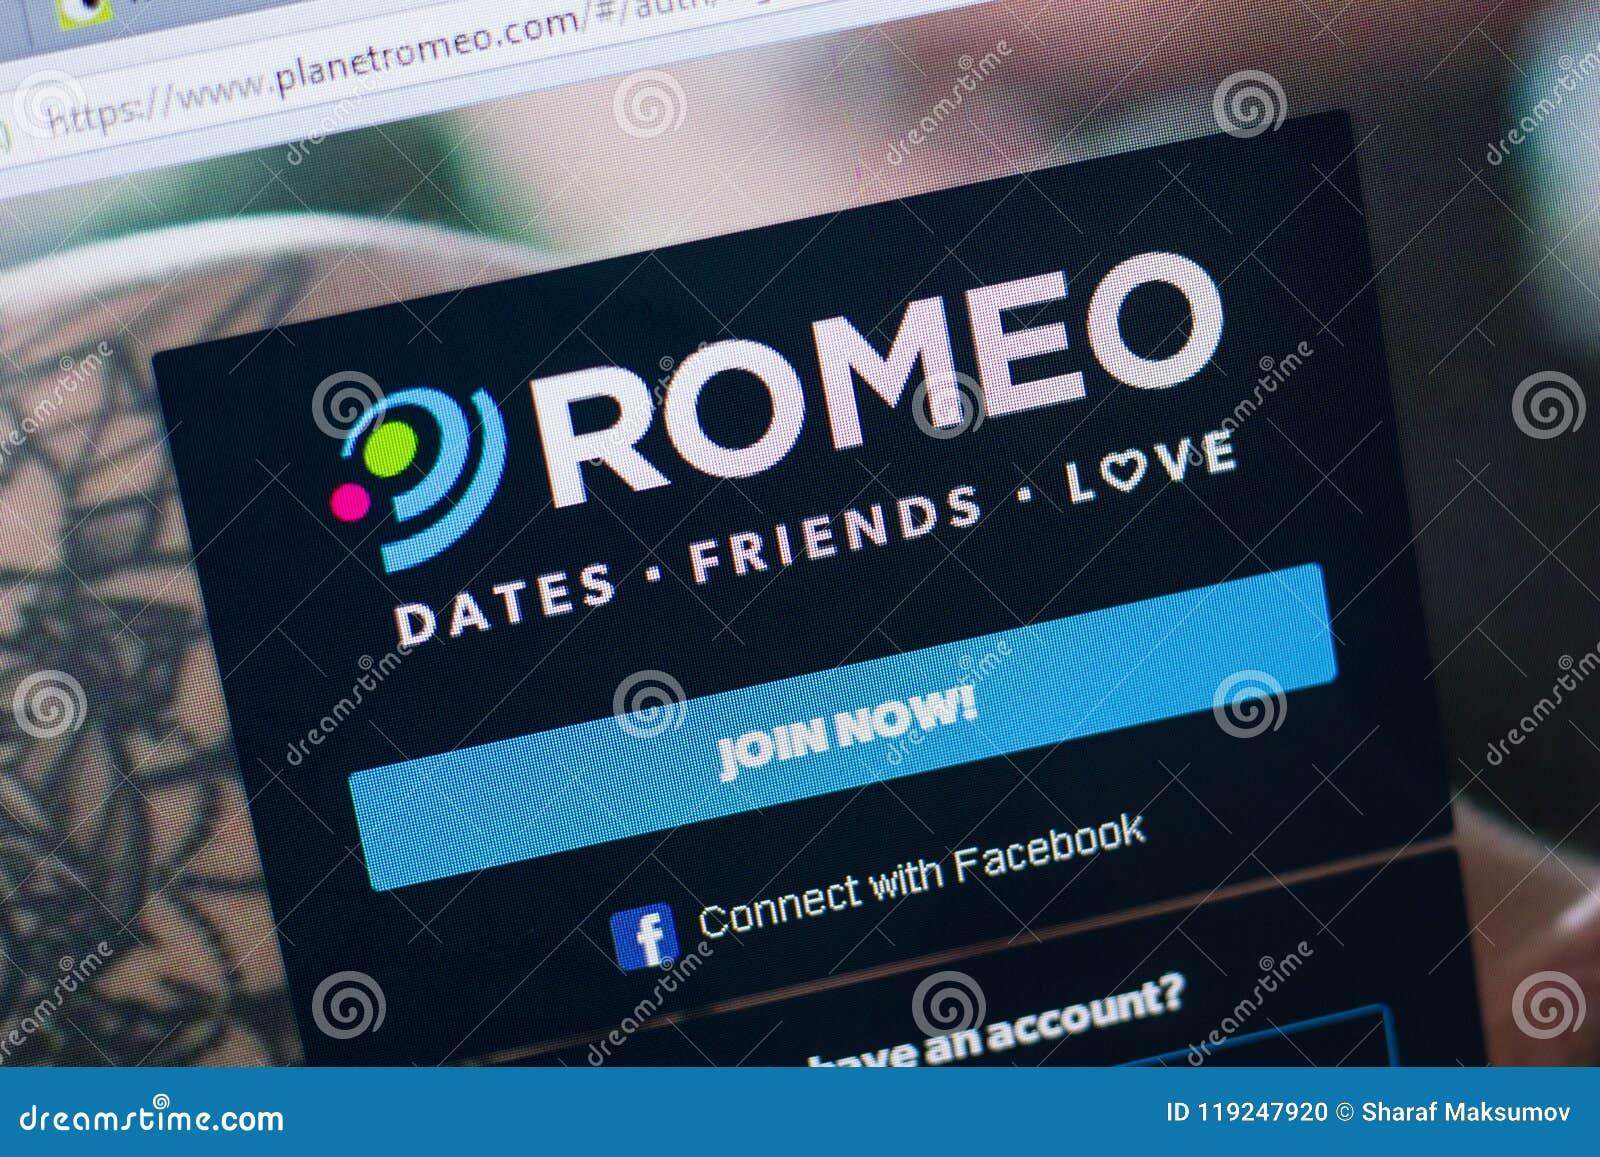 Planetromeo home page